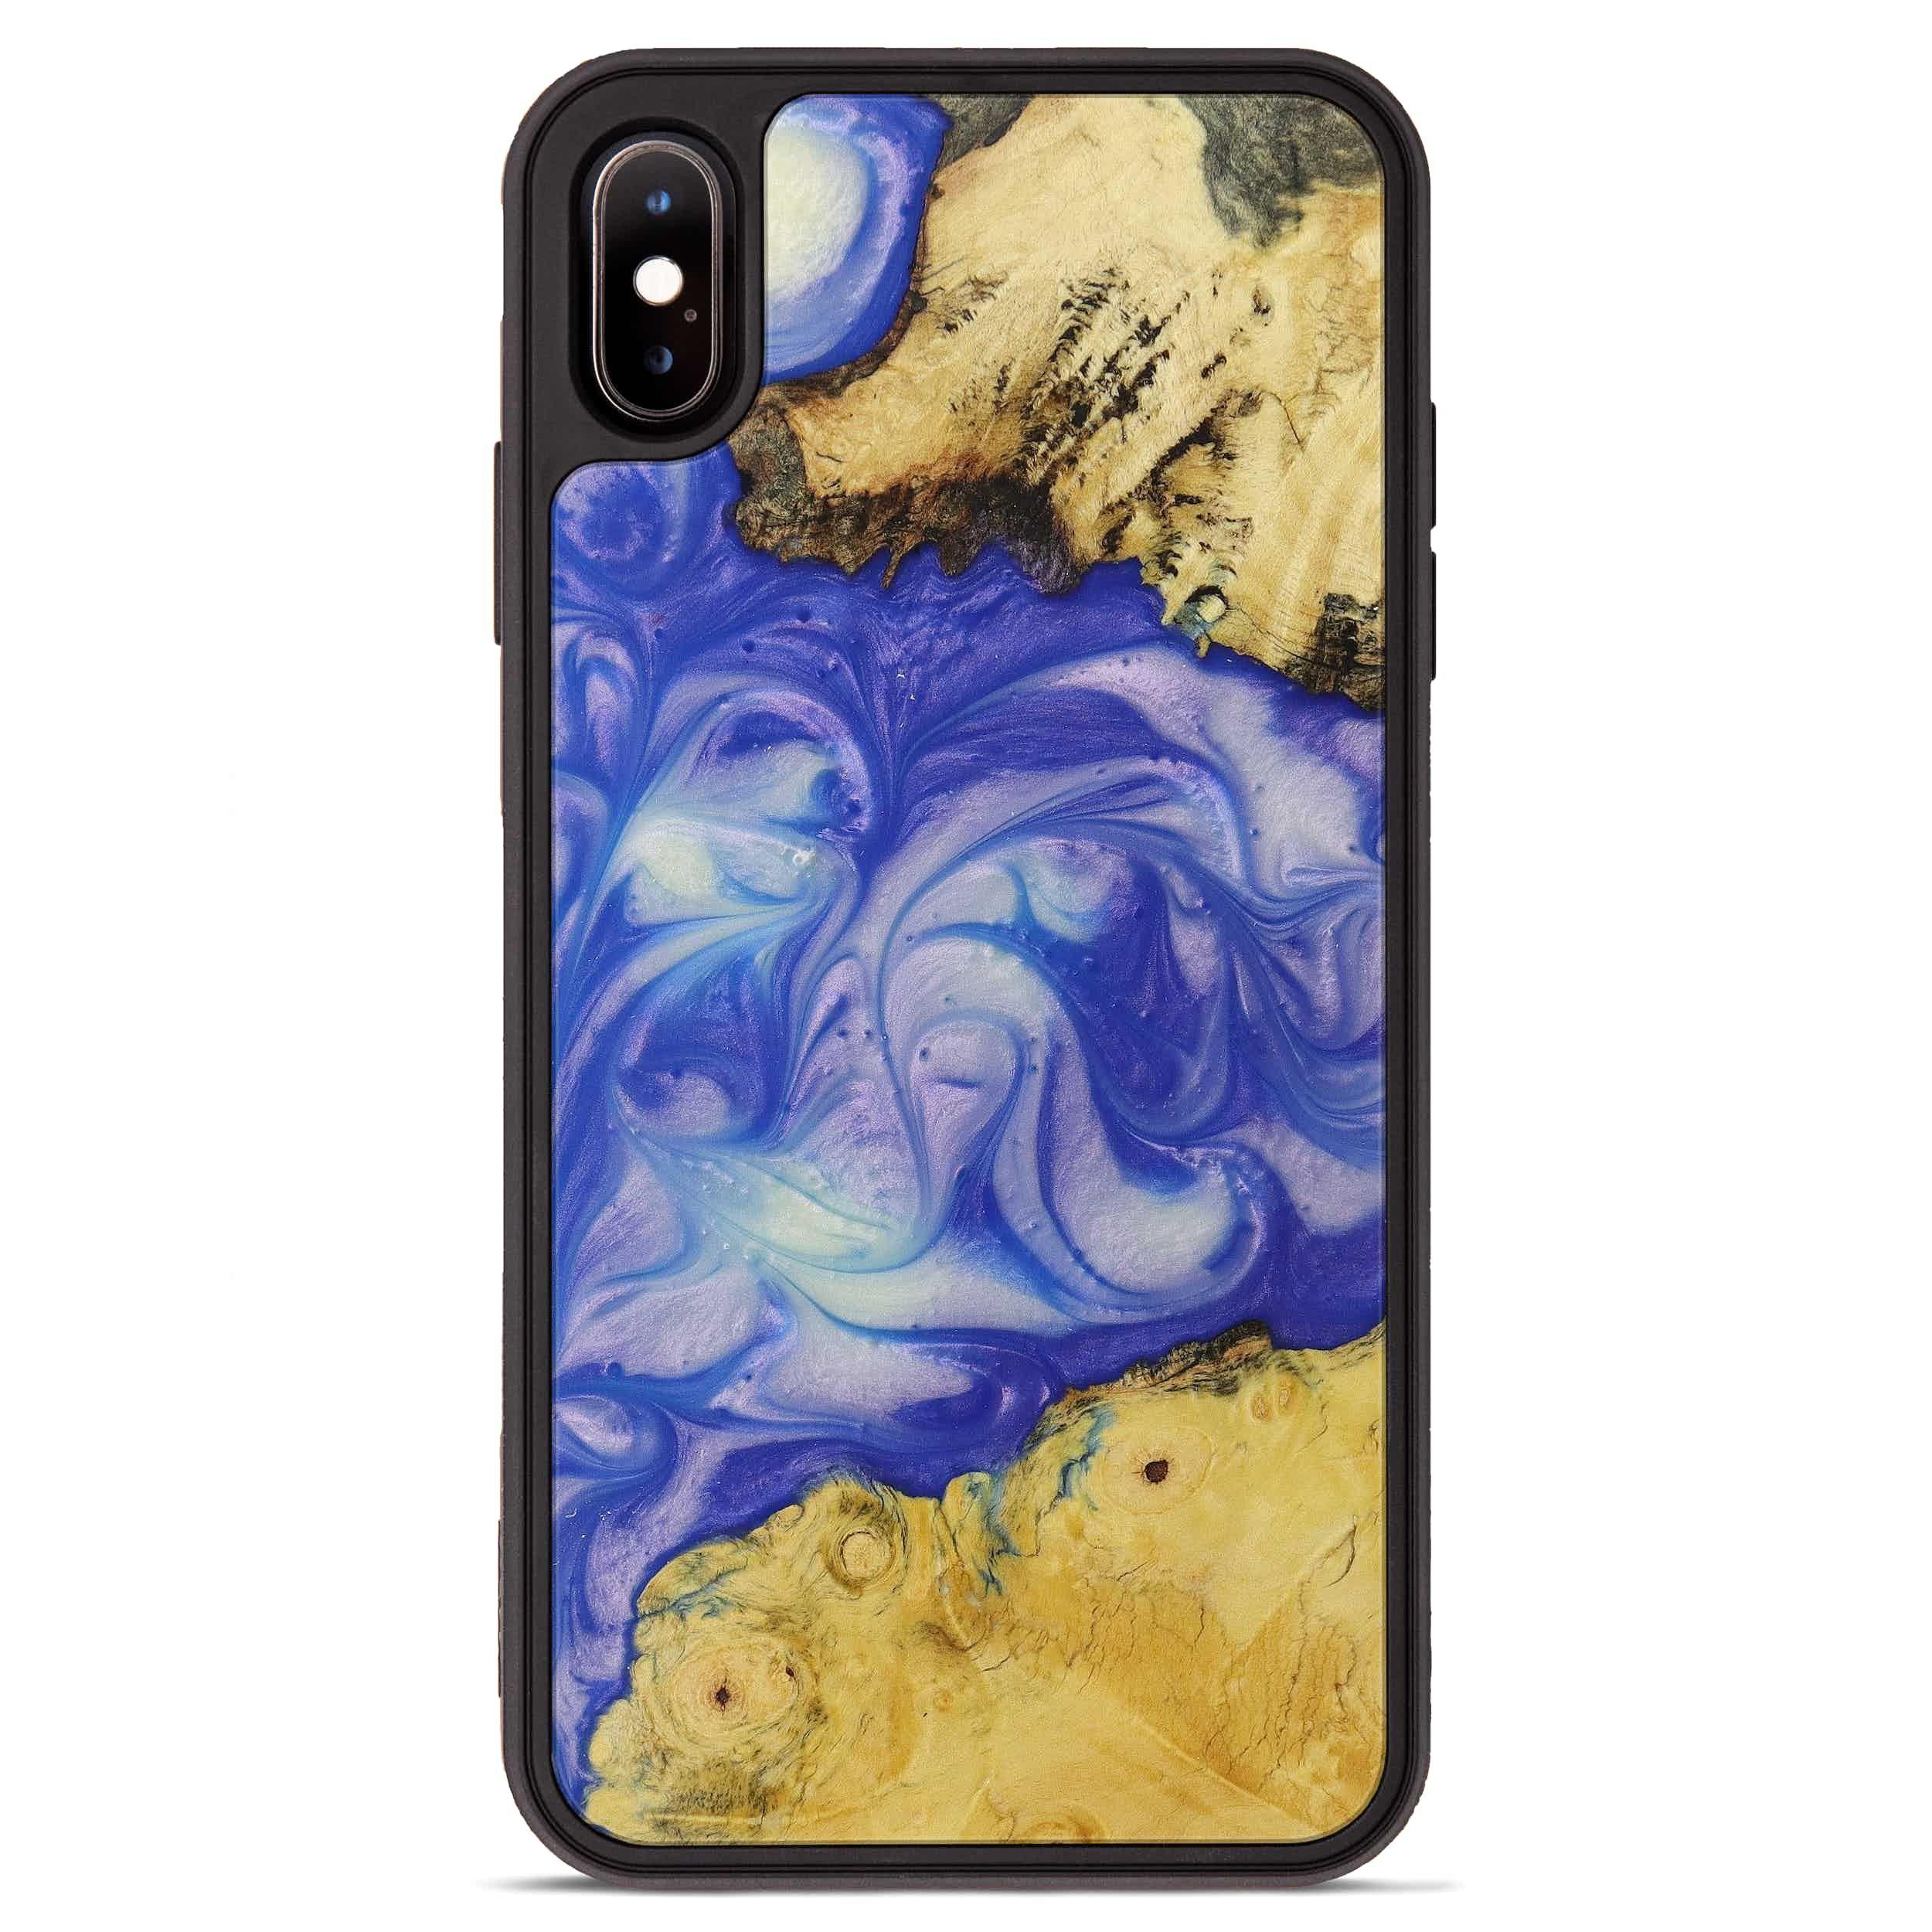 iPhone Xs Max Wood+Resin Phone Case - Bret (Purple, 395908)